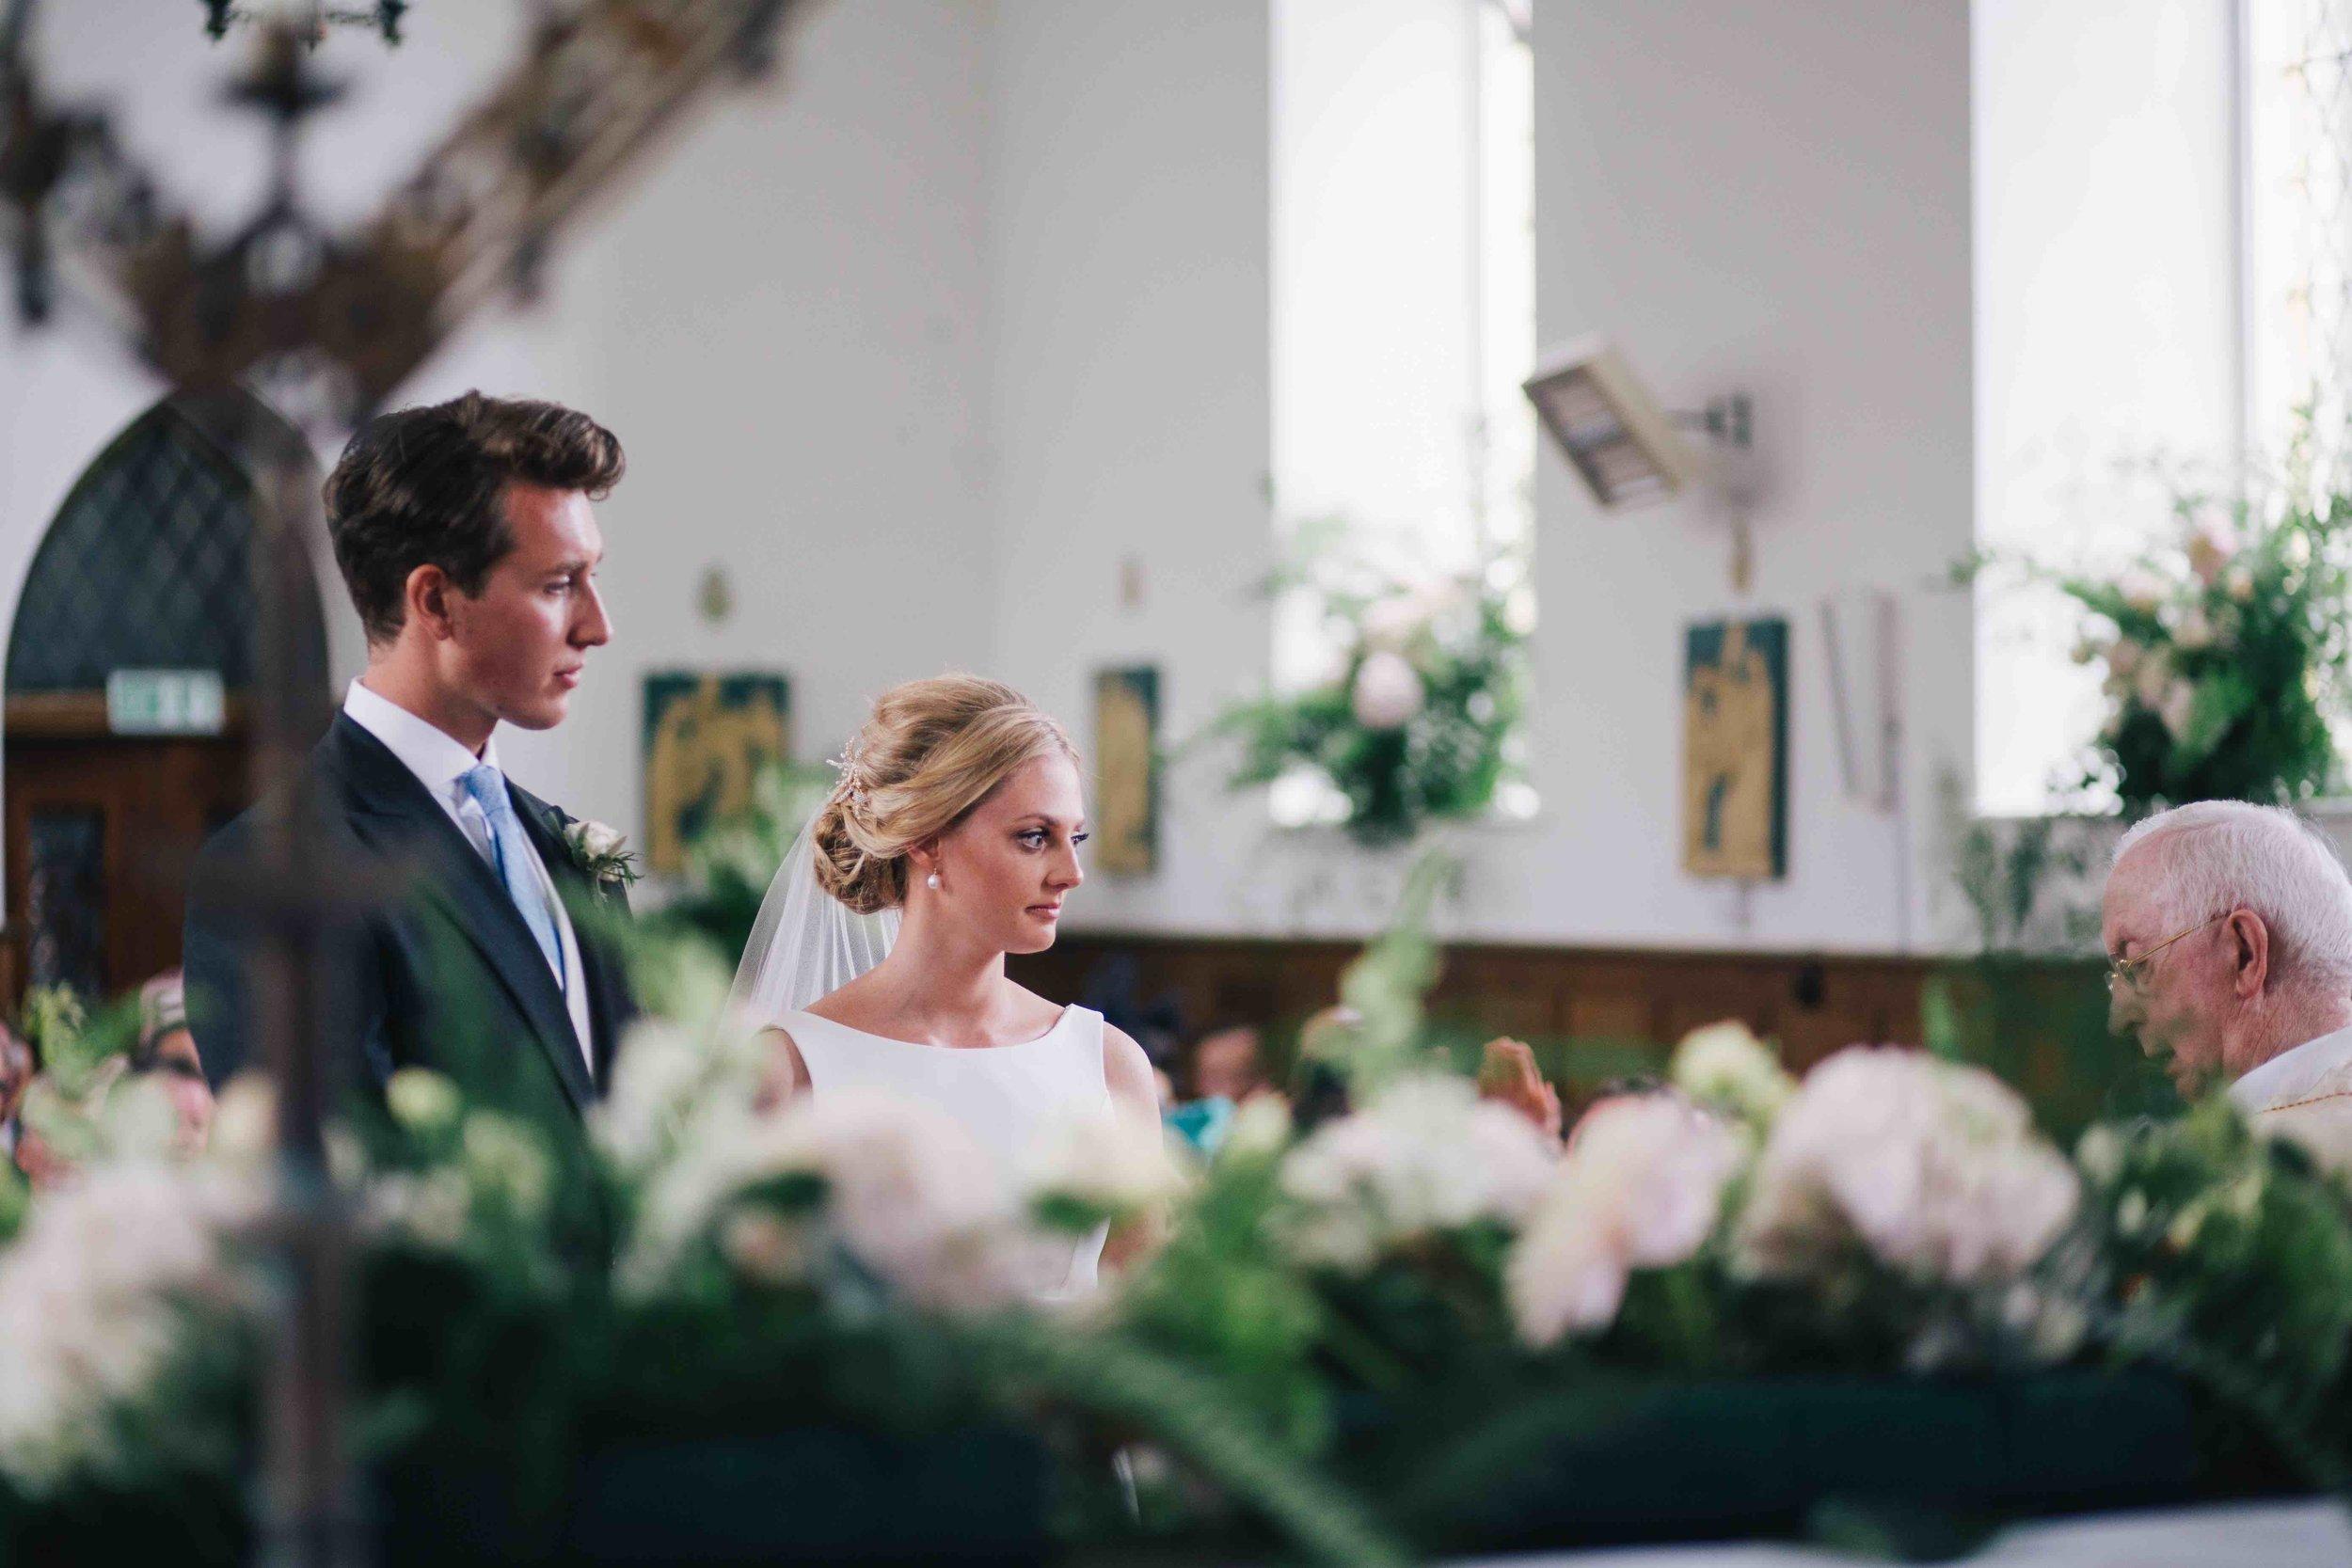 Littleton-Rose-Botanical-Wedding-Cornwall-Wedding-Planners-Ceremony.jpg